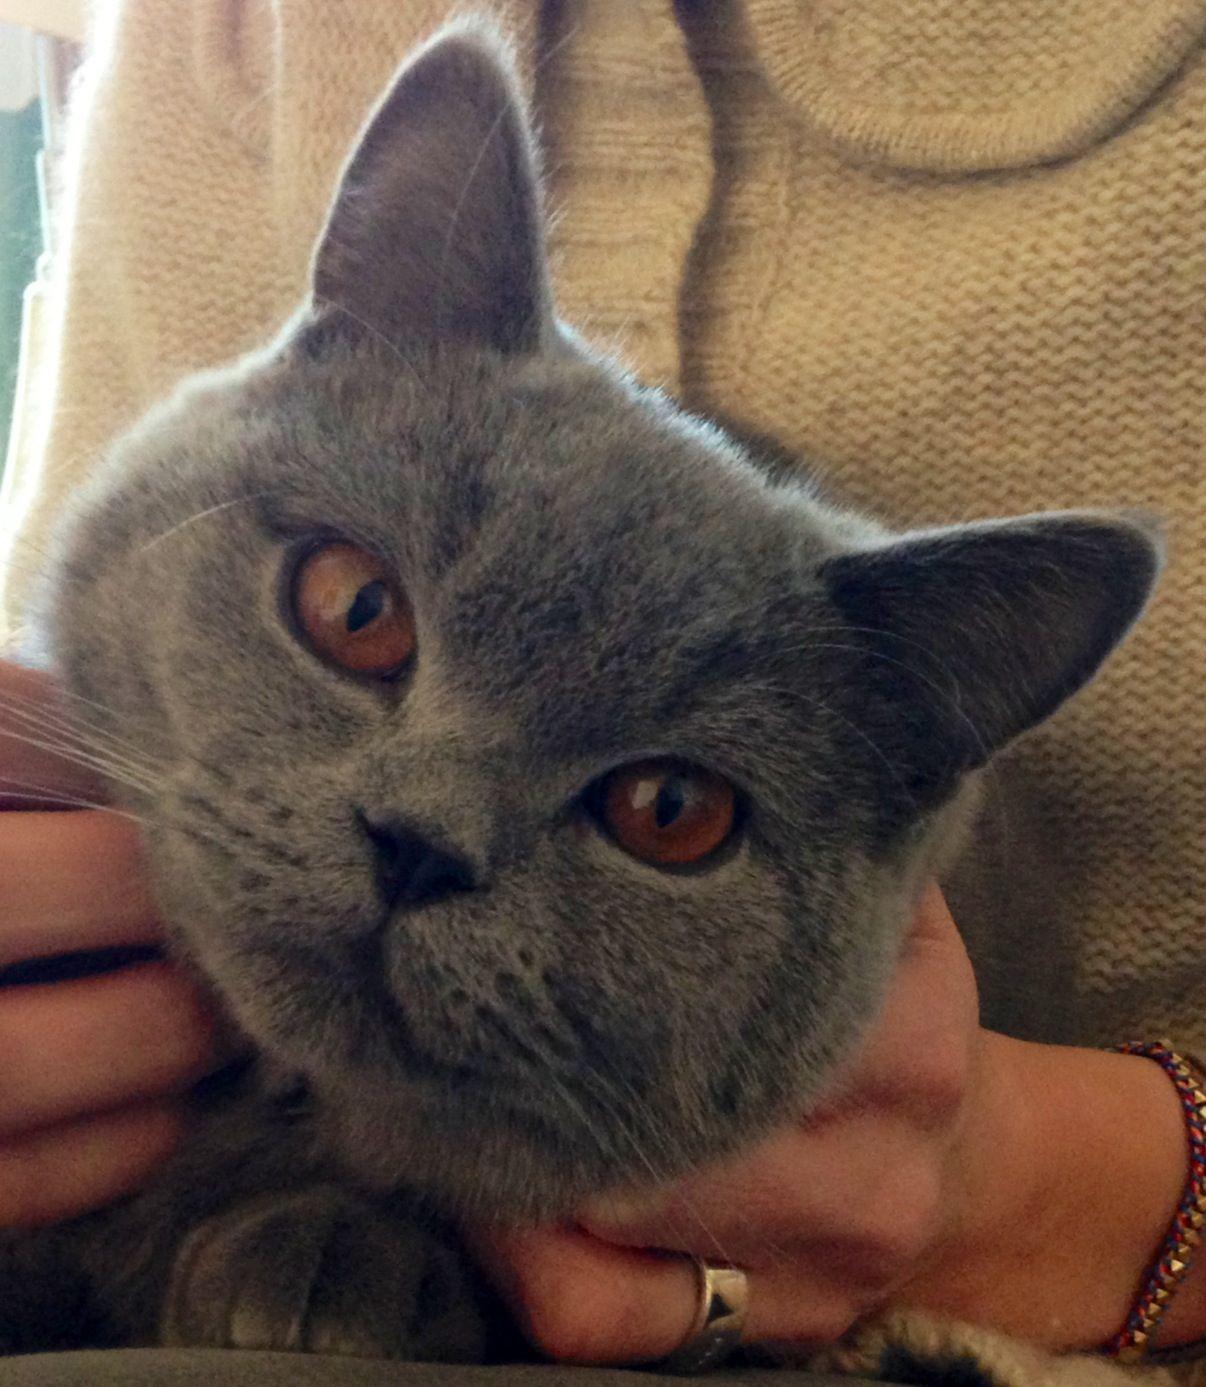 The golden eyes of the blue british shorthair. Hikari was